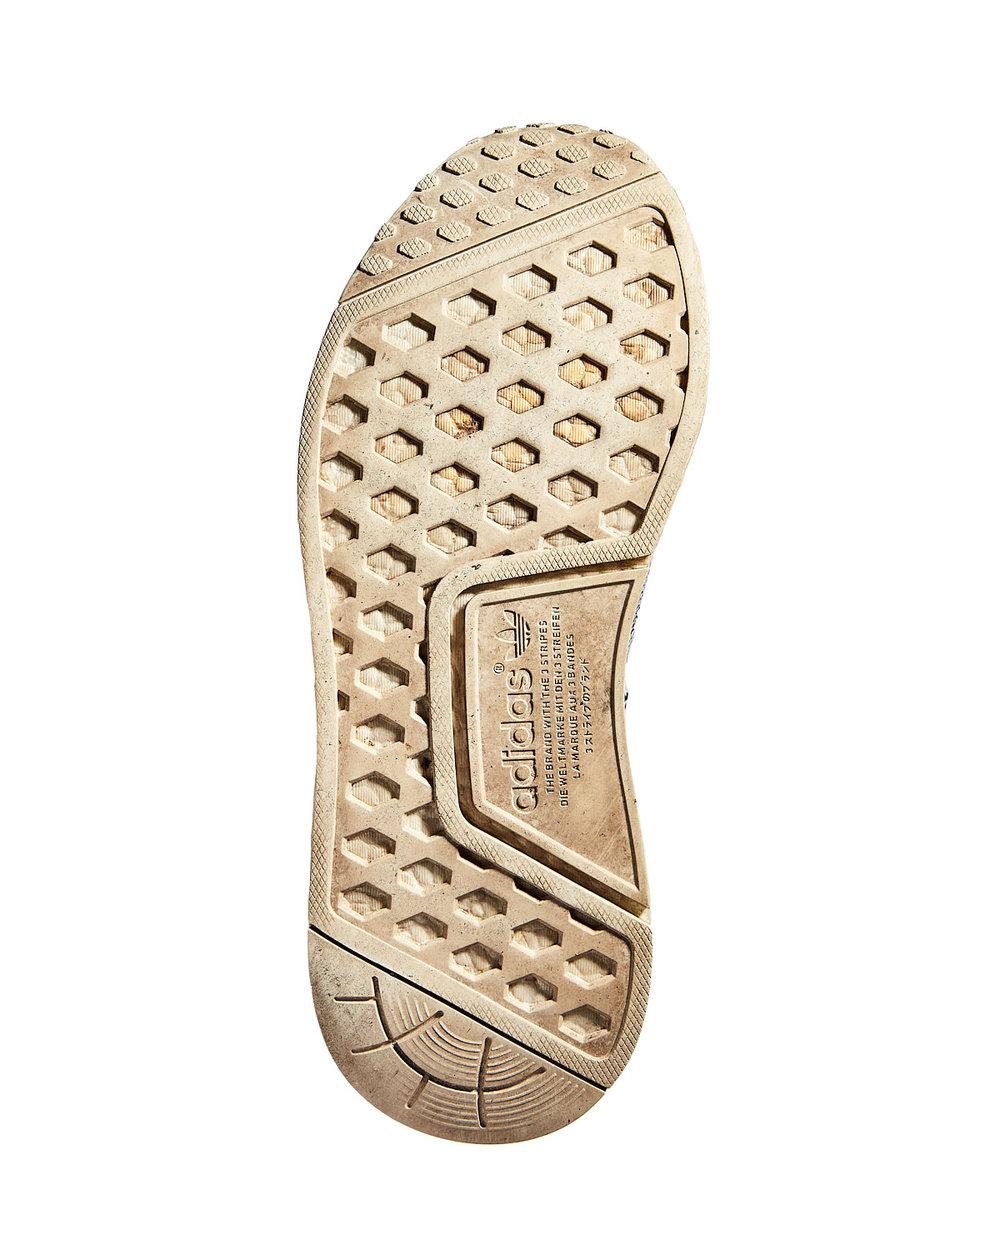 SOLES_ADDIDAS_NMD_R1_WHITE_18565.jpg